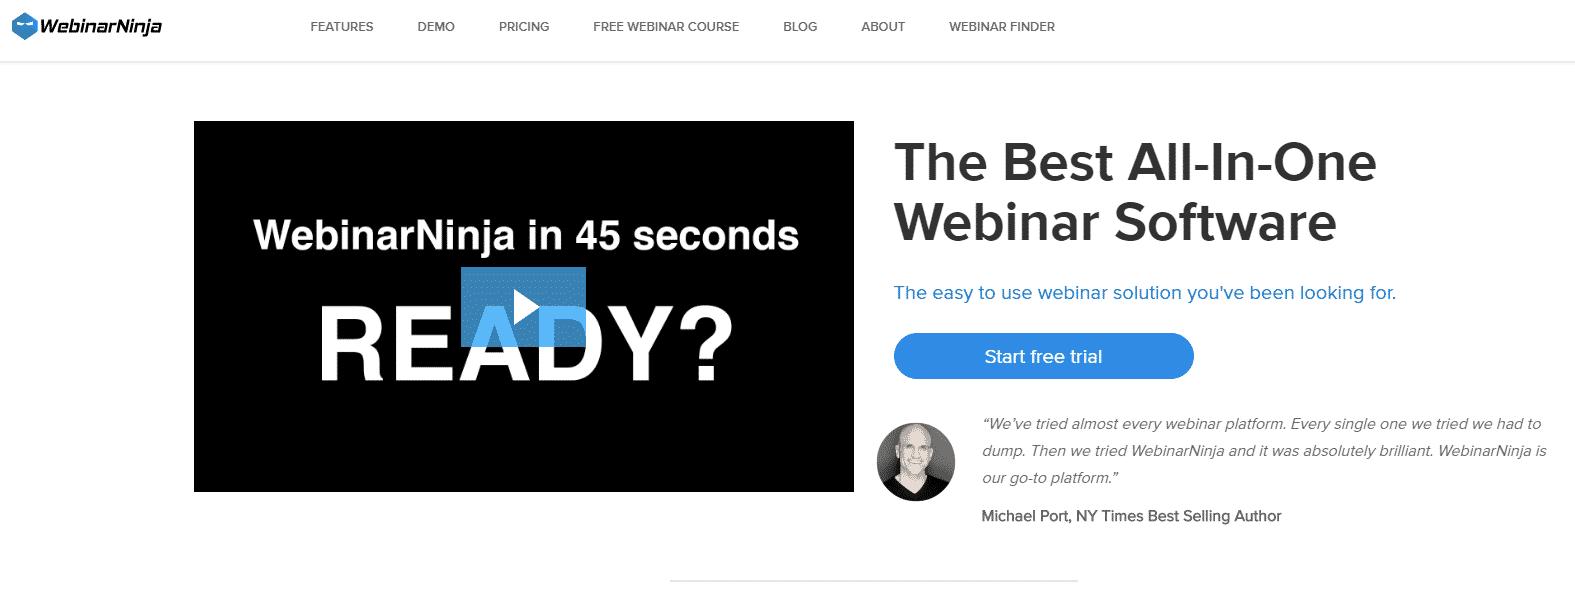 webinarninja home page